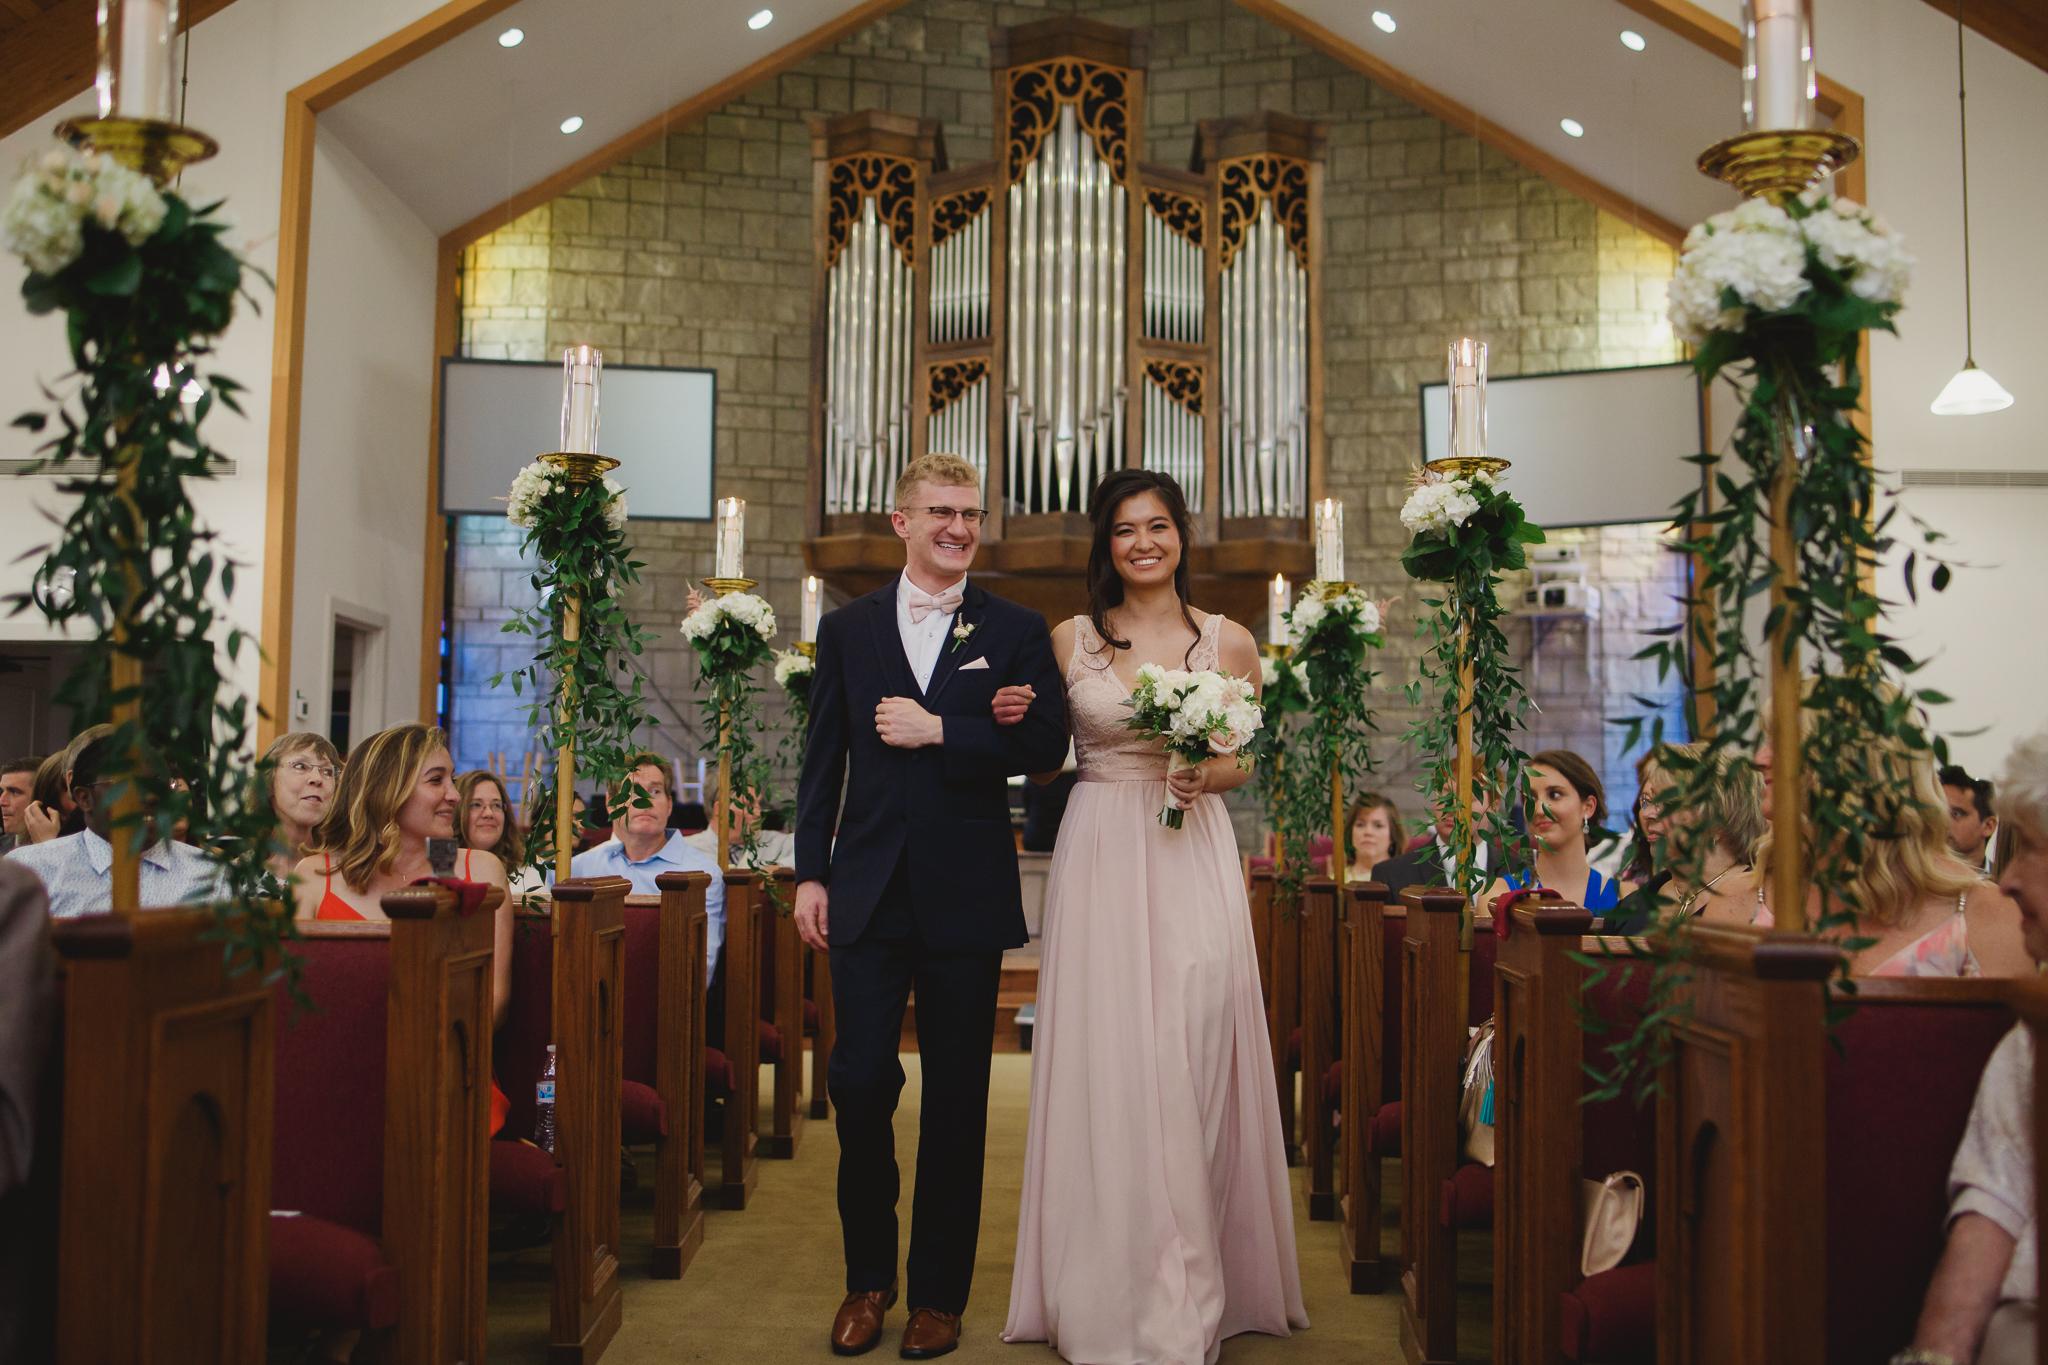 Michael and Kelly - the ashton depot - wedding DFW - wedding photographer- elizalde photography (20 of 150).jpg